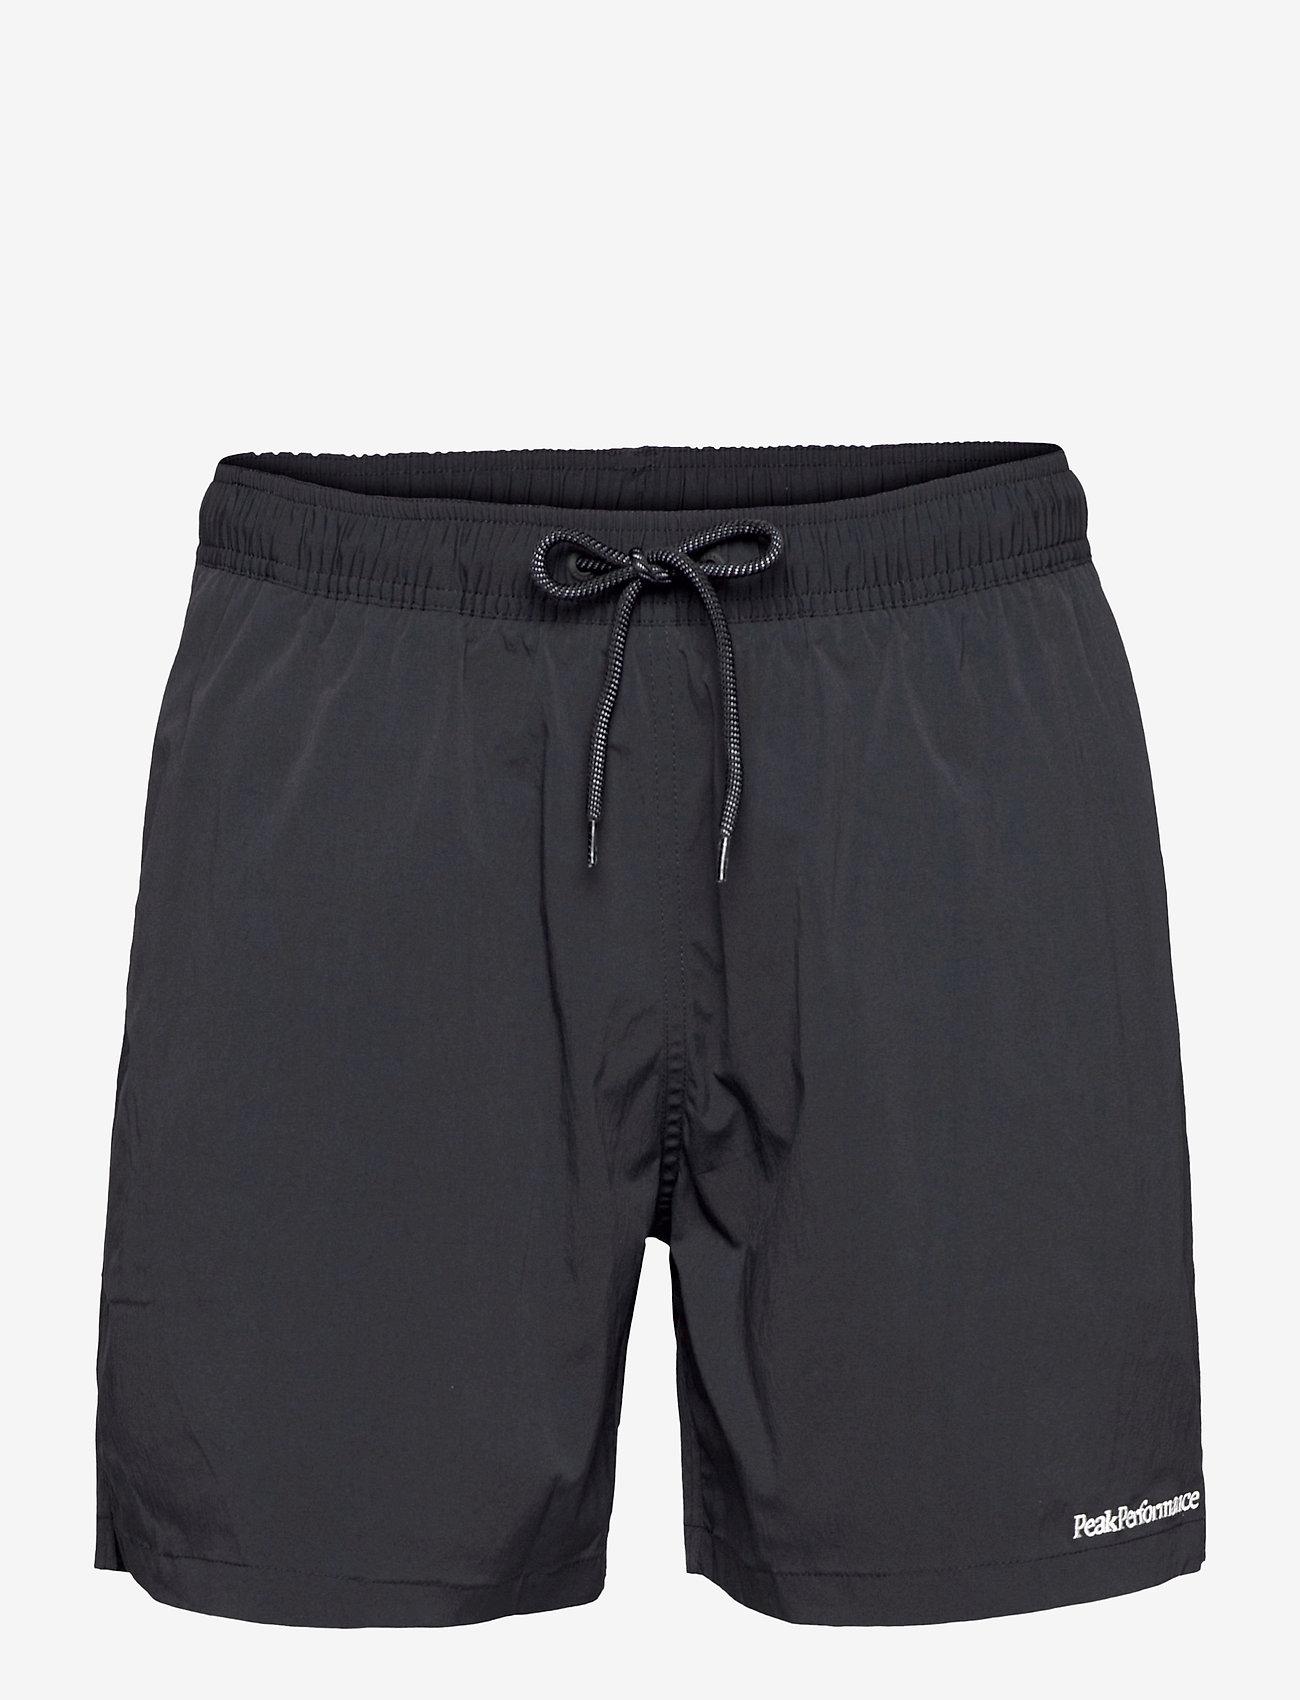 Peak Performance - M Swim Shorts - uimashortsit - black - 0